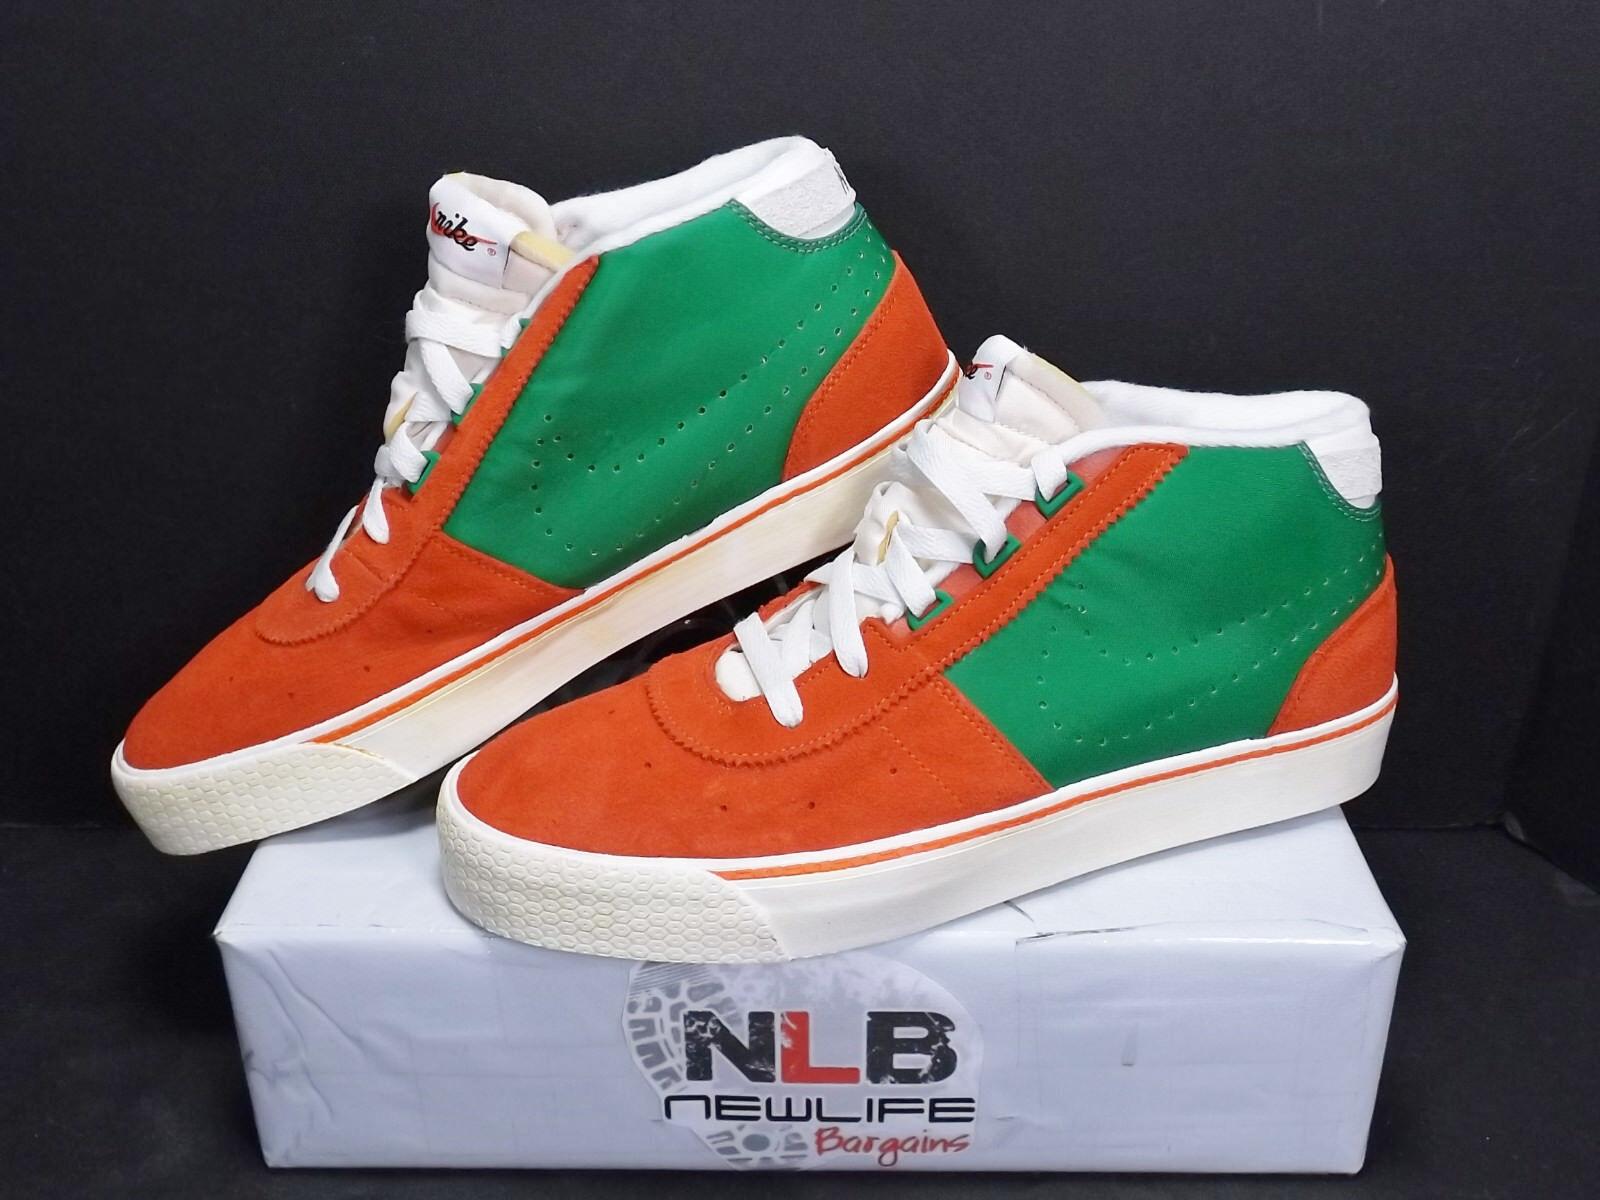 new style 5ea91 044f6 2018 Hachi Nike Hachi 2018 ND QS 457059-830 equipo naranja   Victoria Verde Hombre  comodo gran descuento 1aee99